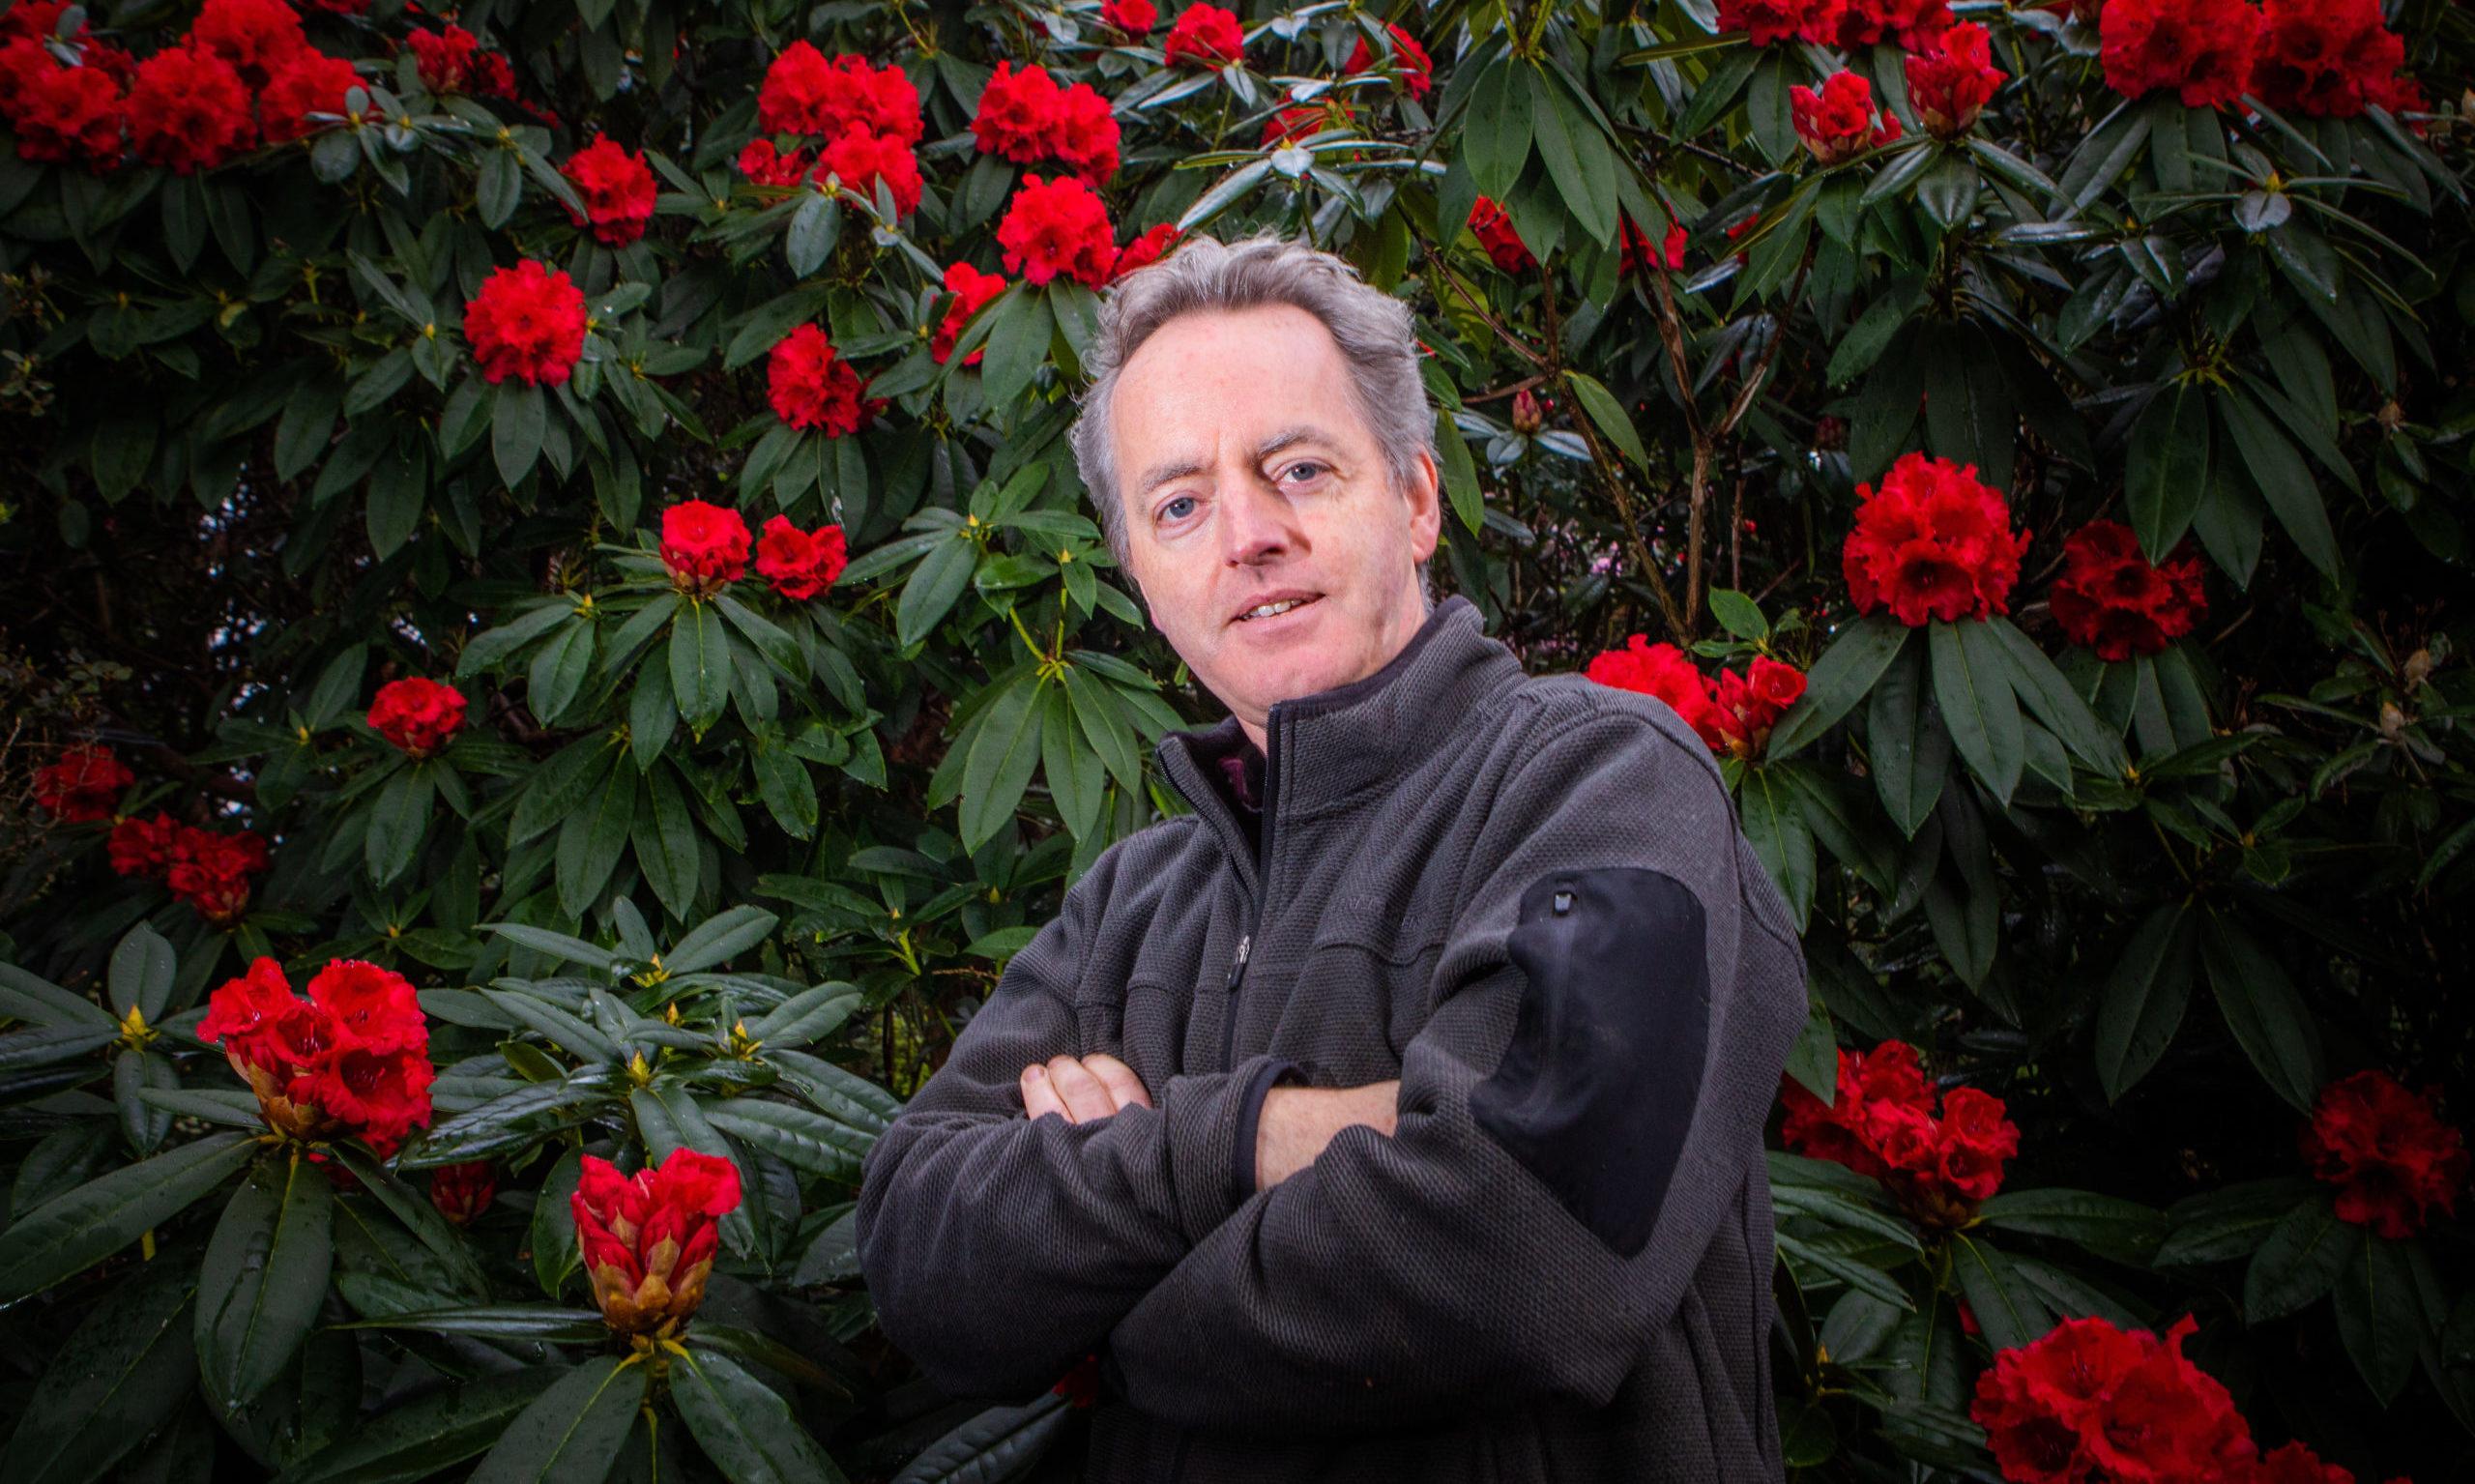 Ken Cox pictured a year ago alongside Rhododendron Taurus at Glendoick Garden Centre, Glencarse, near Perth.